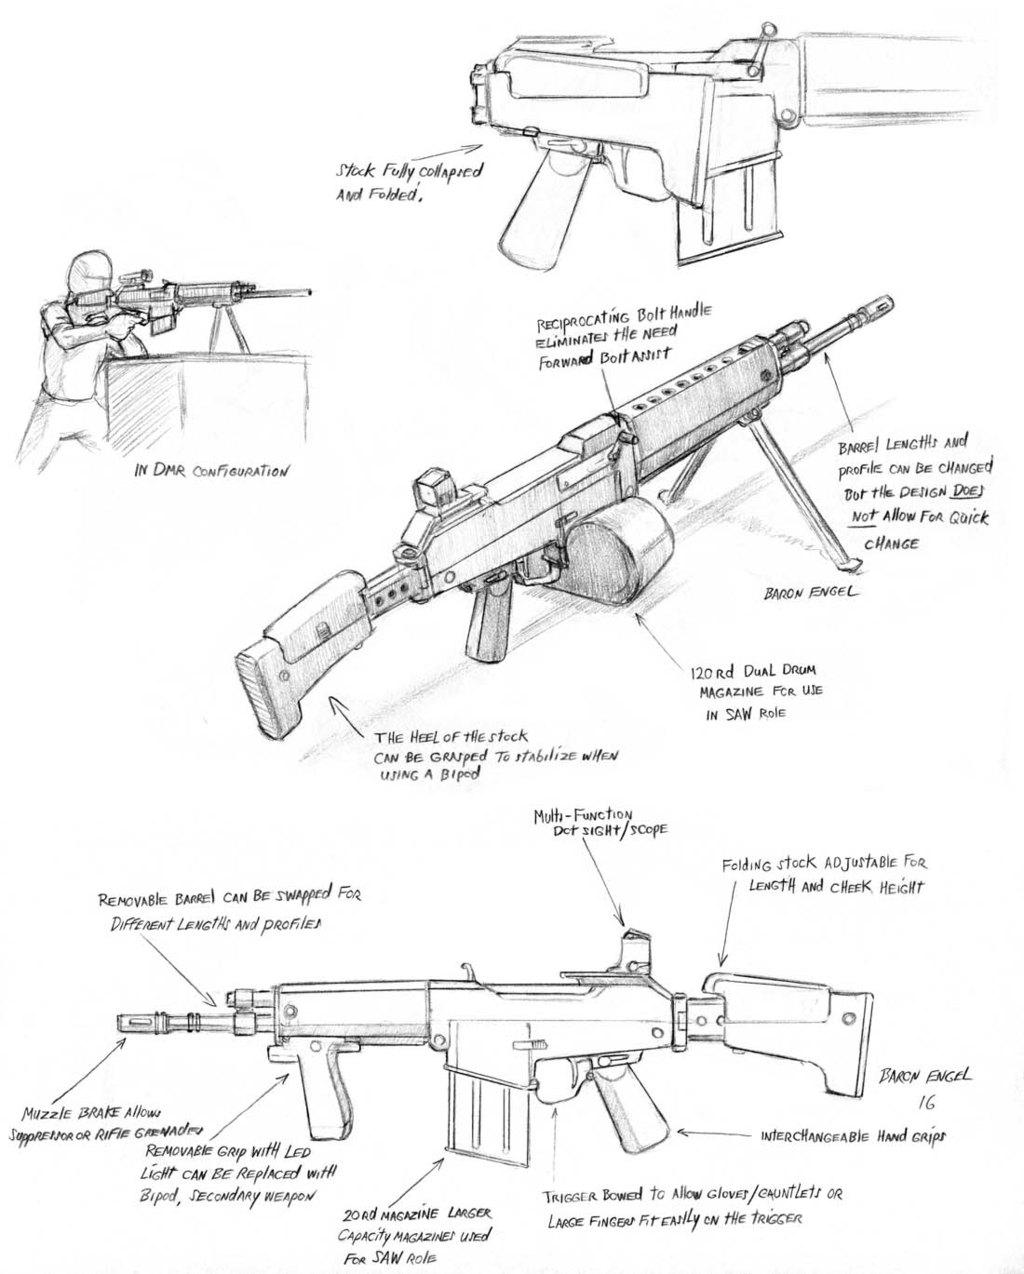 The Volkssturm R1 Rifle